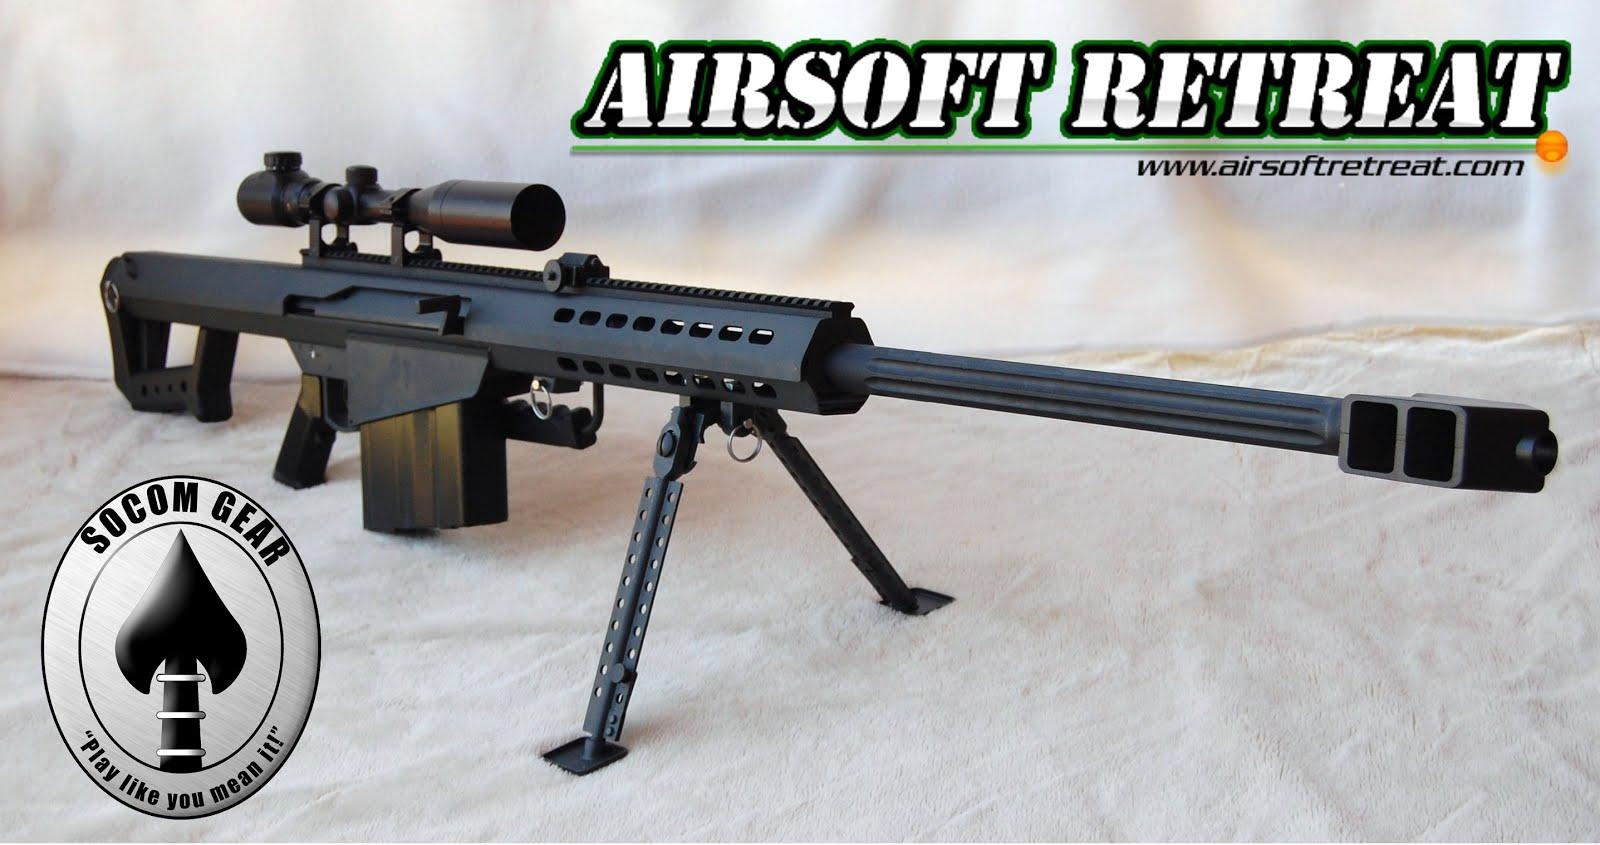 SOCOM Gear Barrett M82A1 AEG | Booligan's Airsoft Reviews